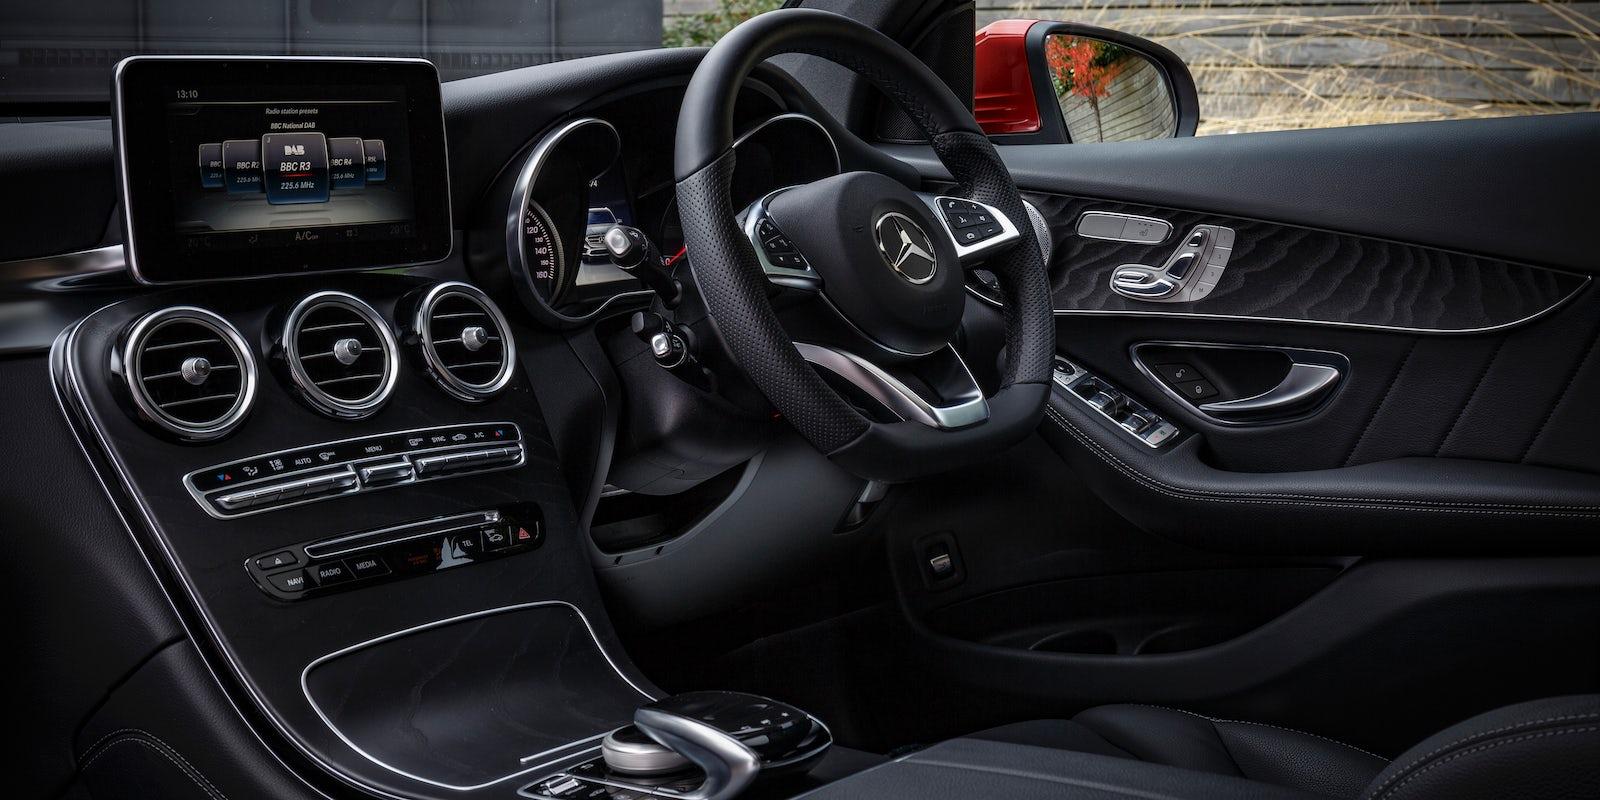 Mercedes GLC Coupe Interior & Infotainment